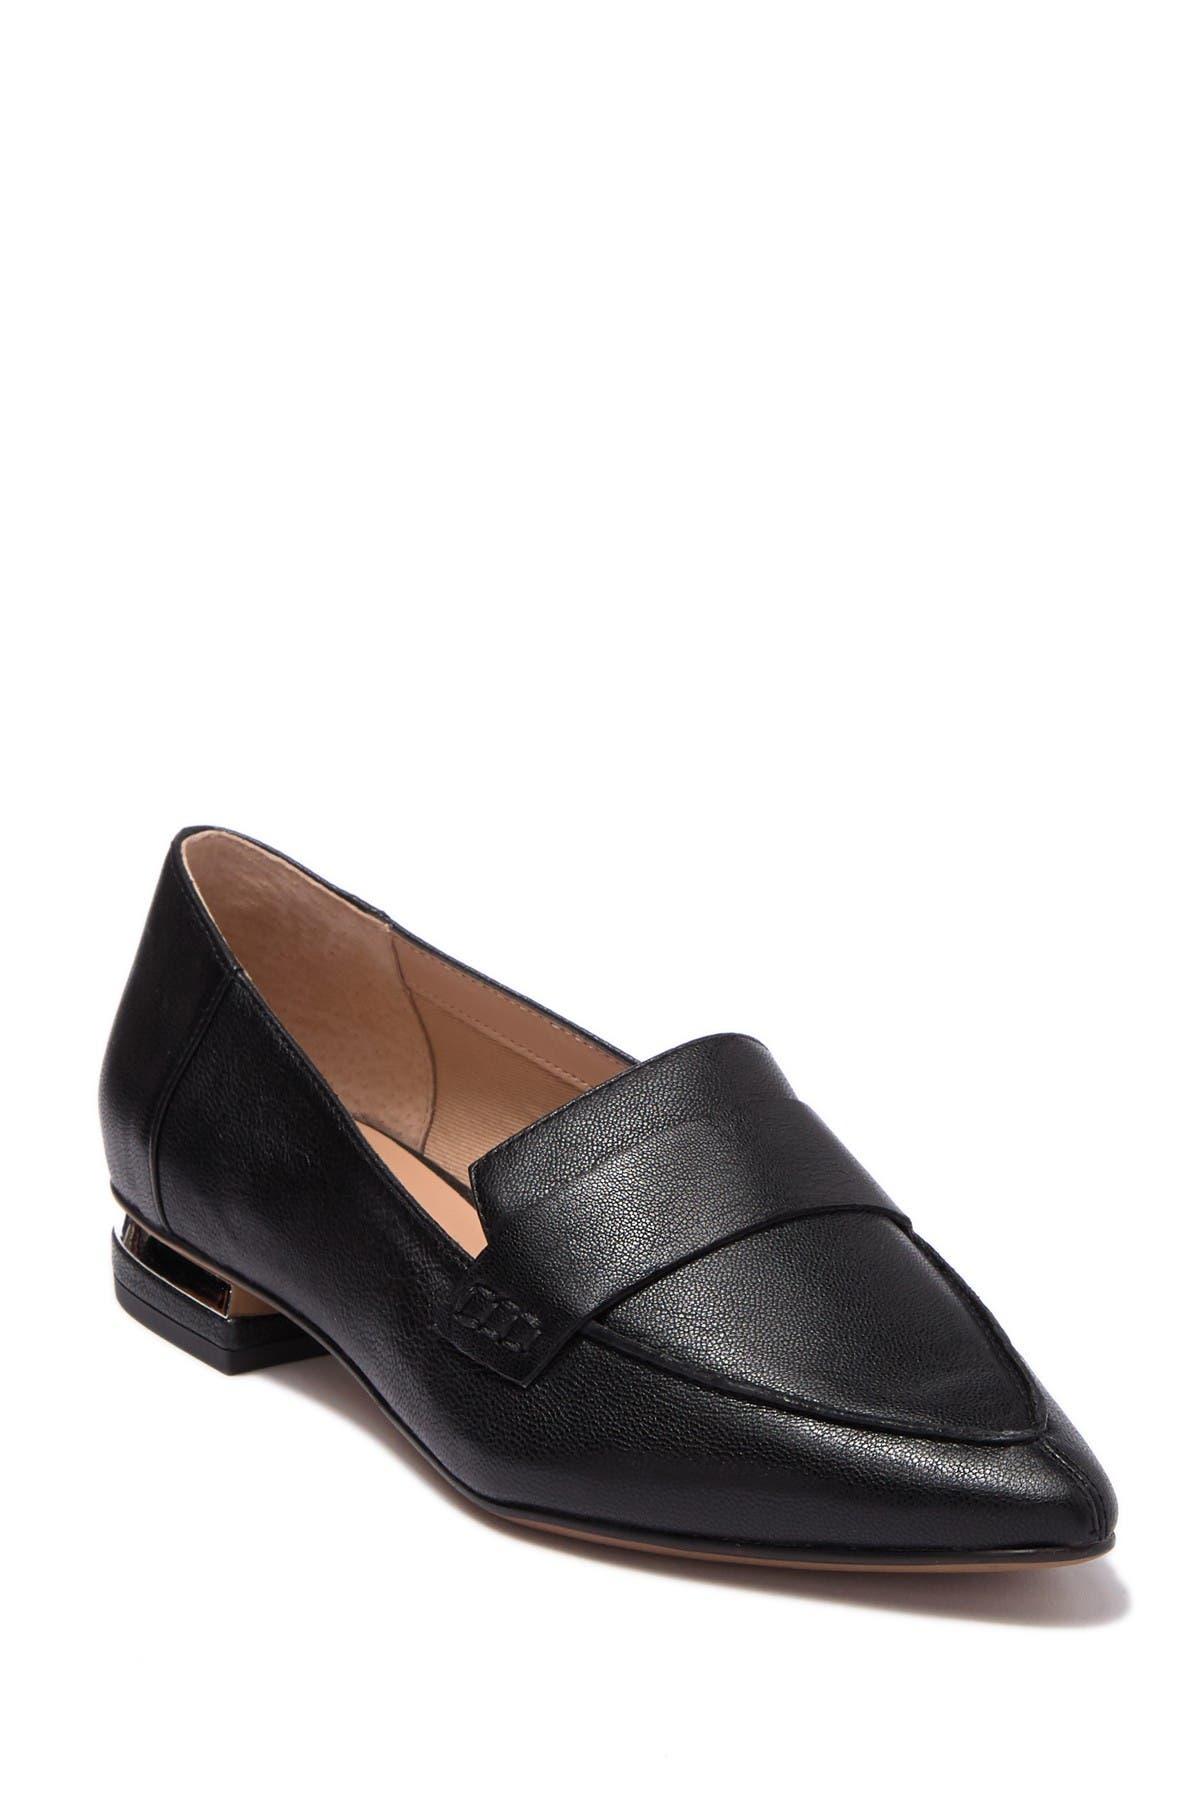 Franco Sarto | Sansa Leather Loafer